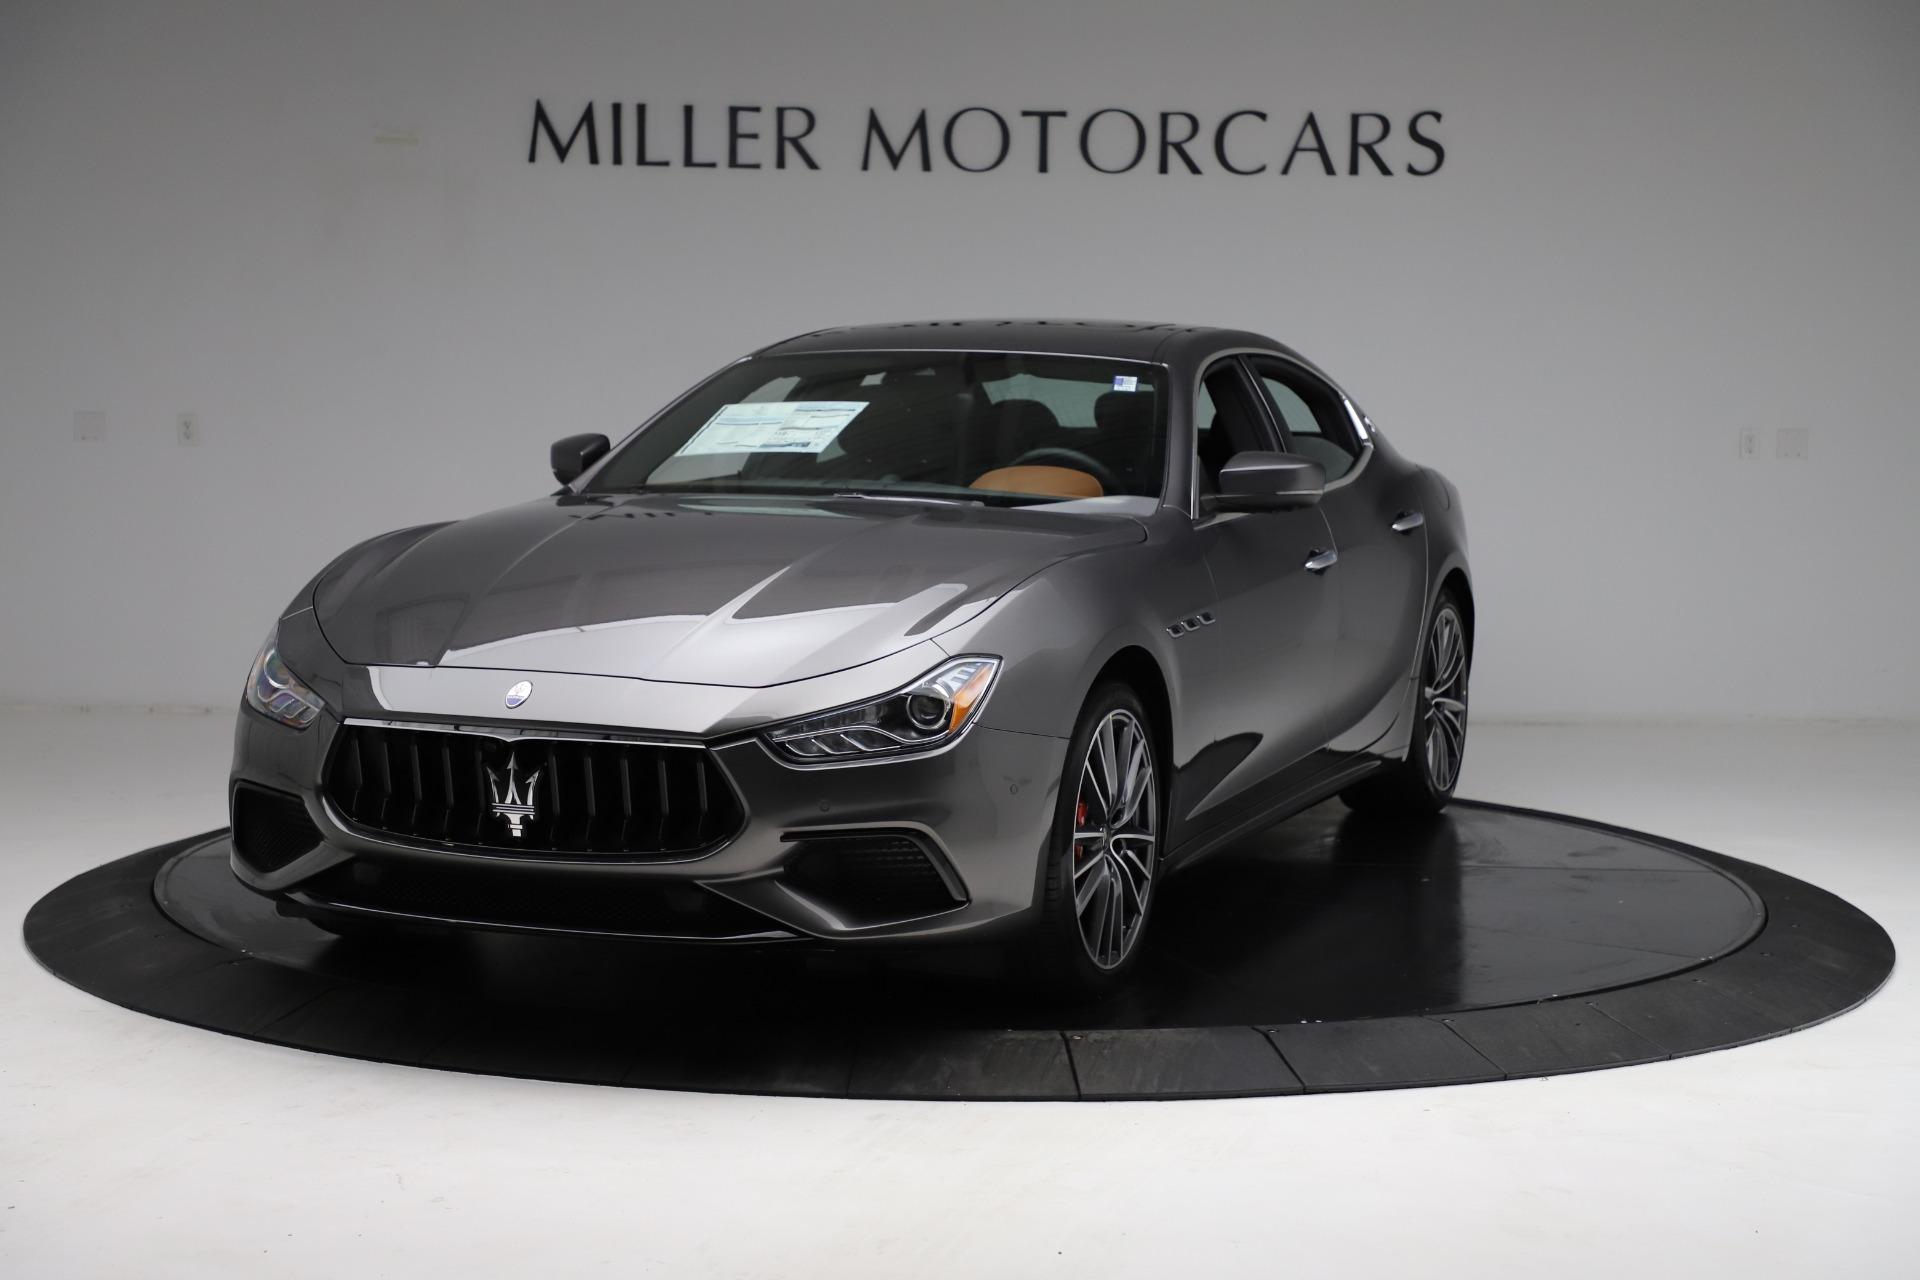 New 2021 Maserati Ghibli S Q4 for sale $90,525 at Maserati of Greenwich in Greenwich CT 06830 1